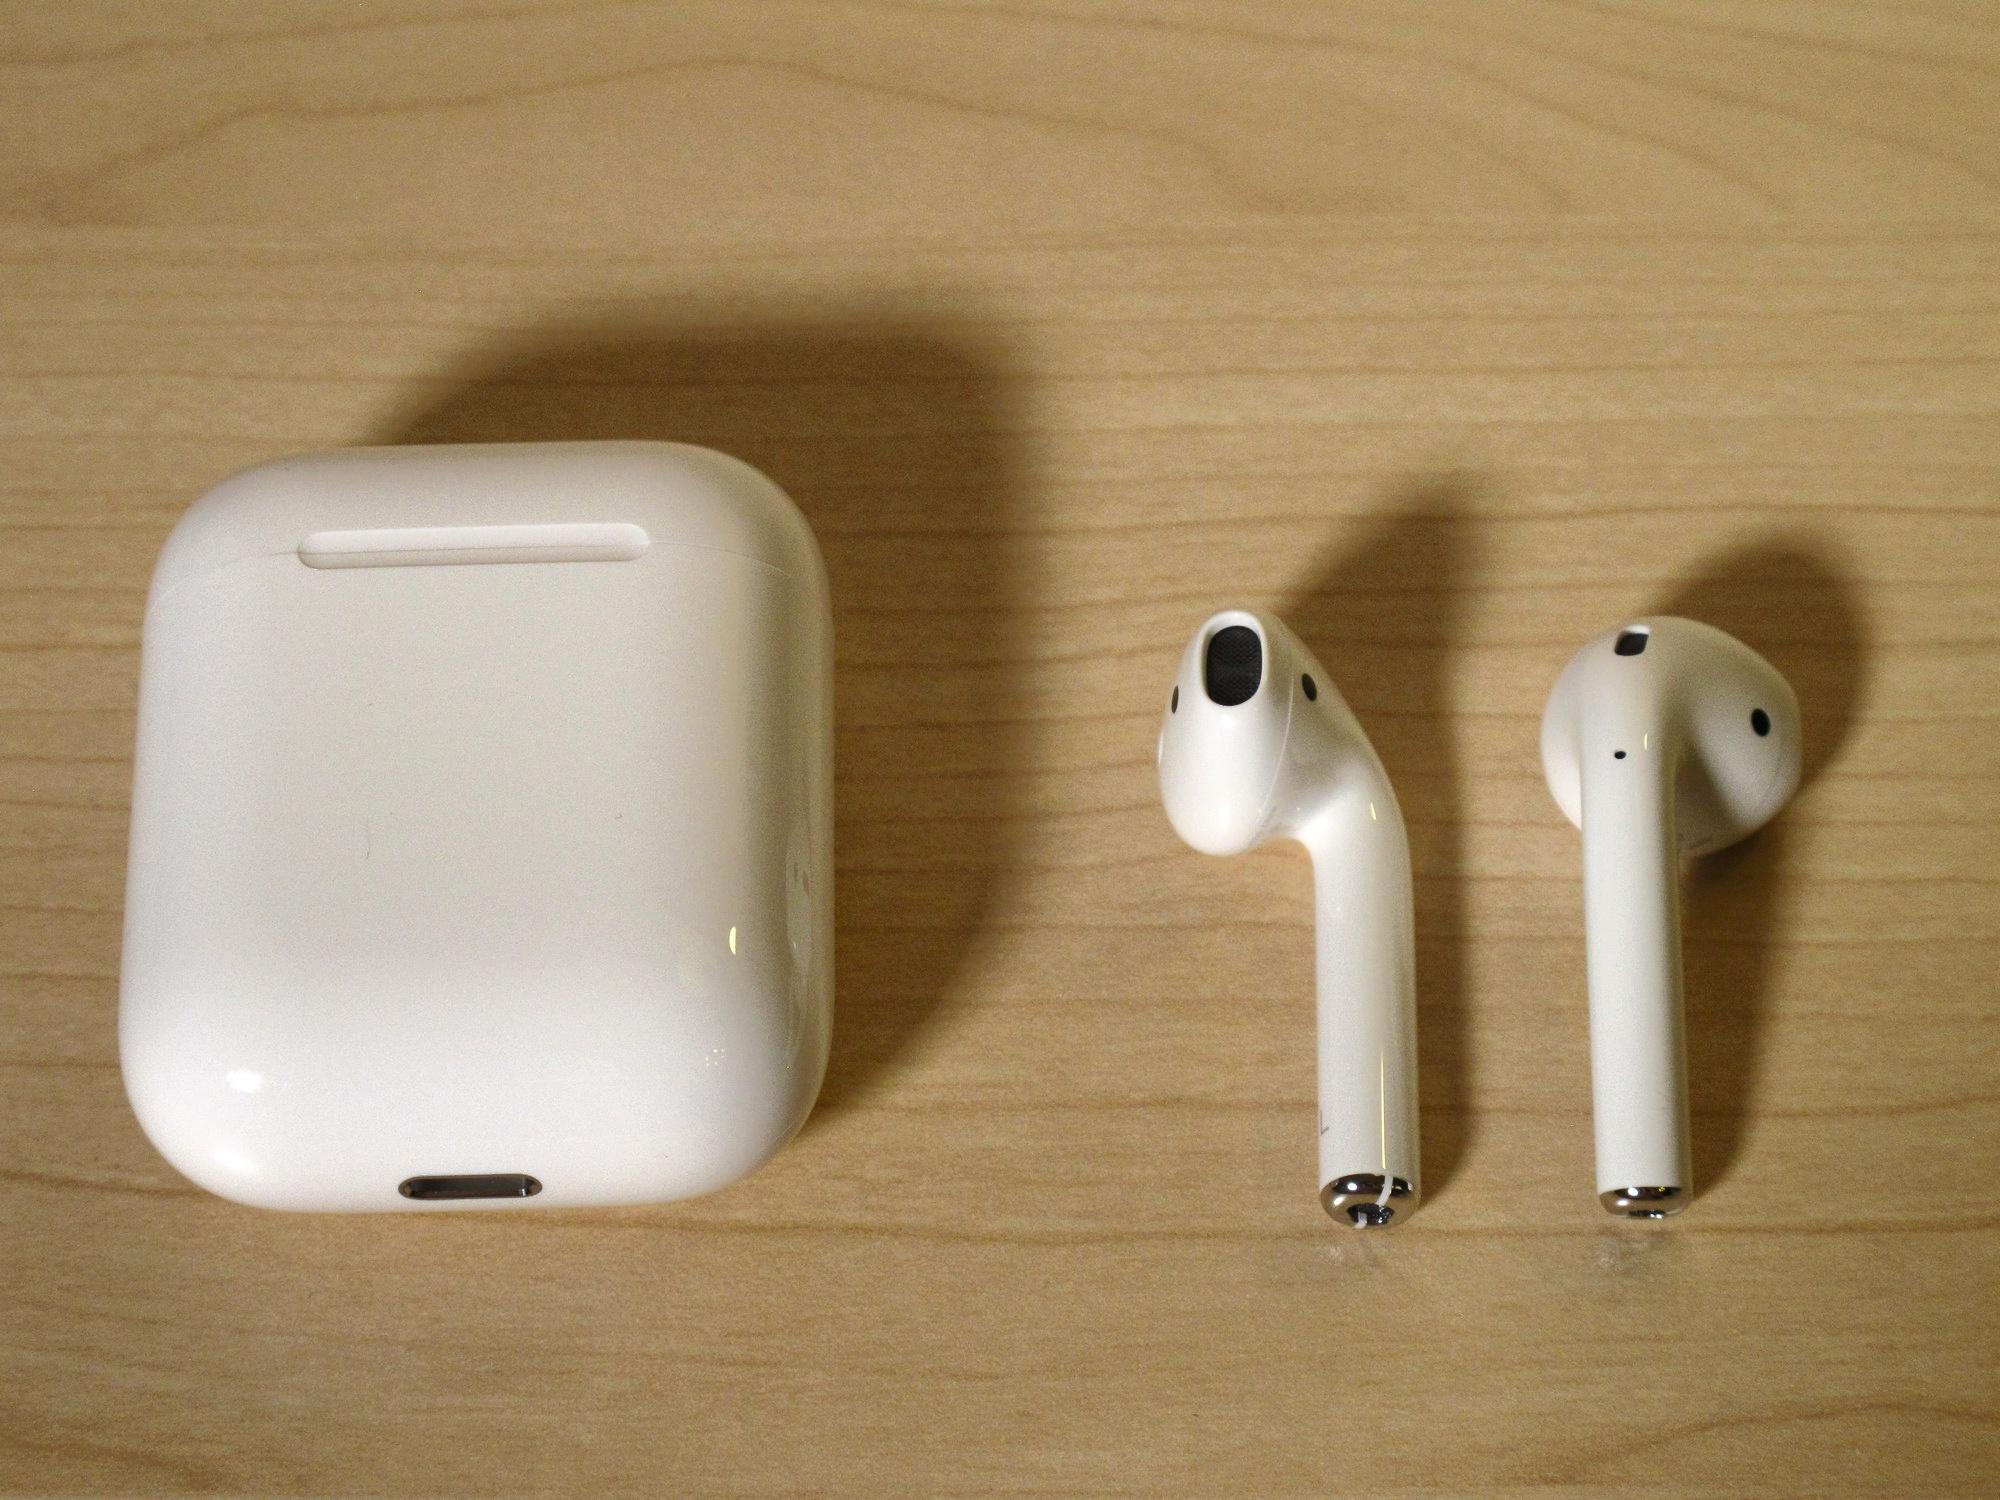 Обзор от покупателя на Наушники Apple AirPods — интернет-магазин ... 312da82b5116b